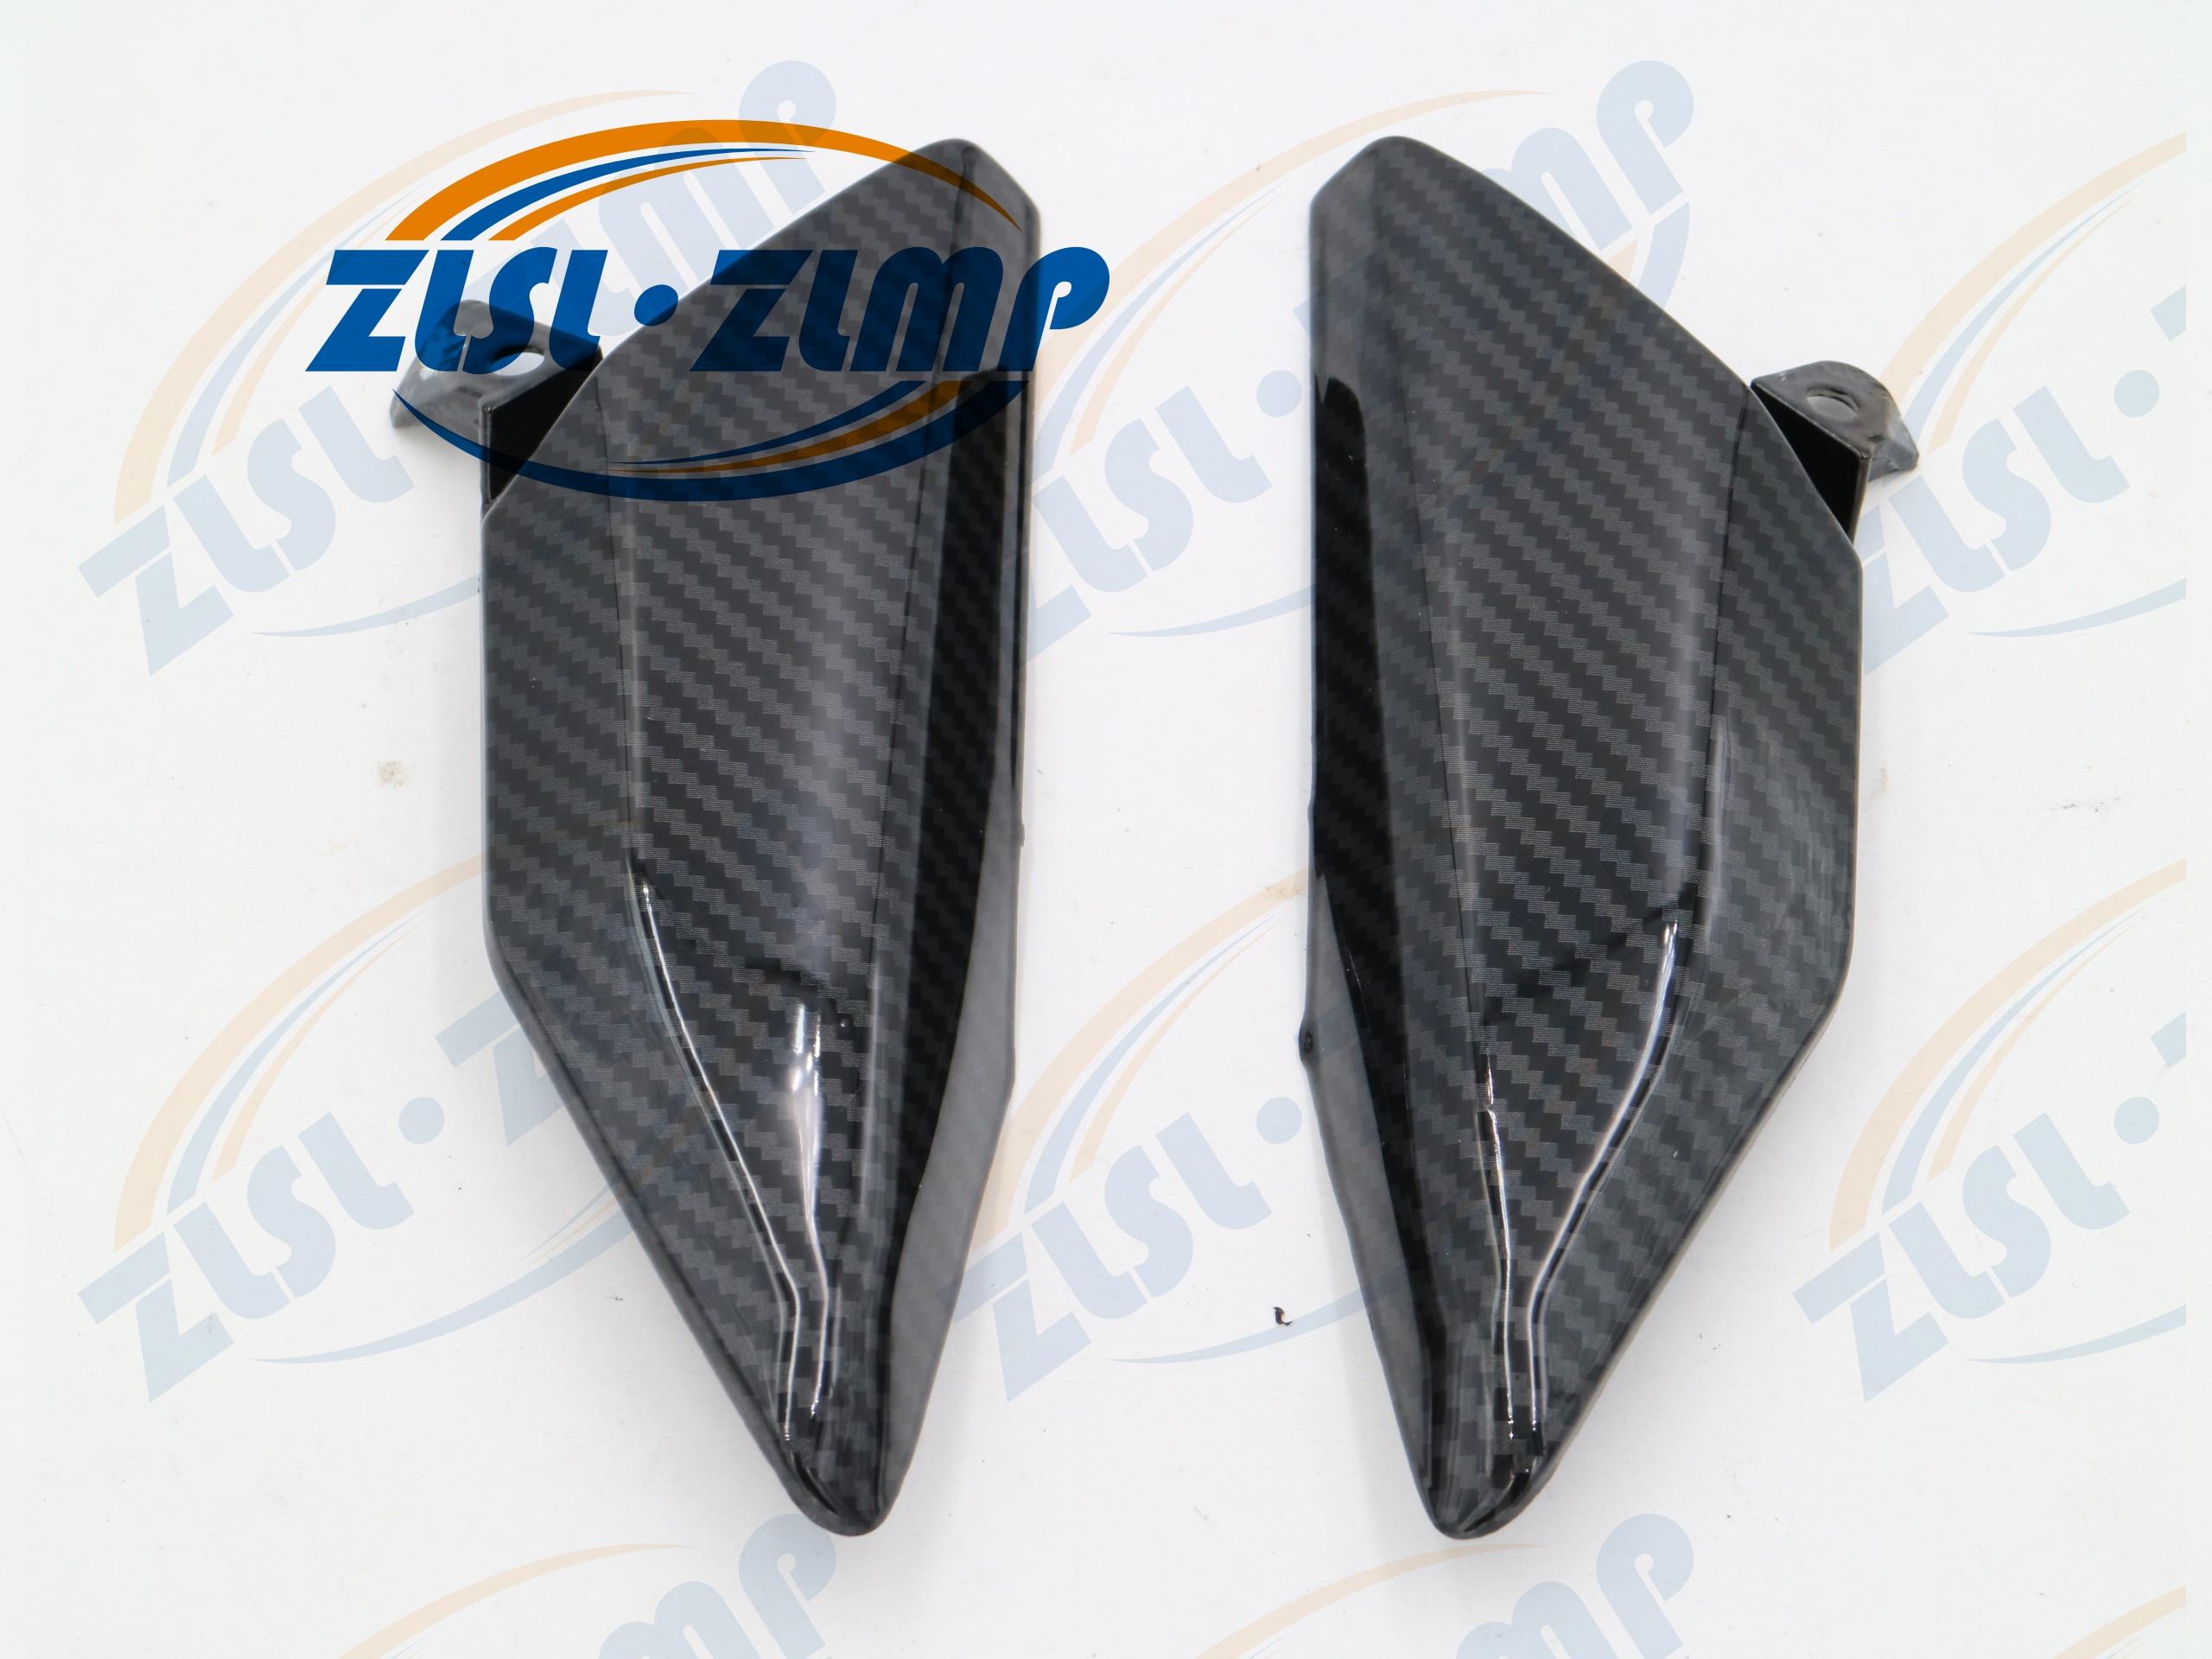 Motorcycle Carbon Fiber Side Panel Fairings Body Cover Frame Guard Motorcycle Fairing For Honda CBR600RR F5 2007-2012